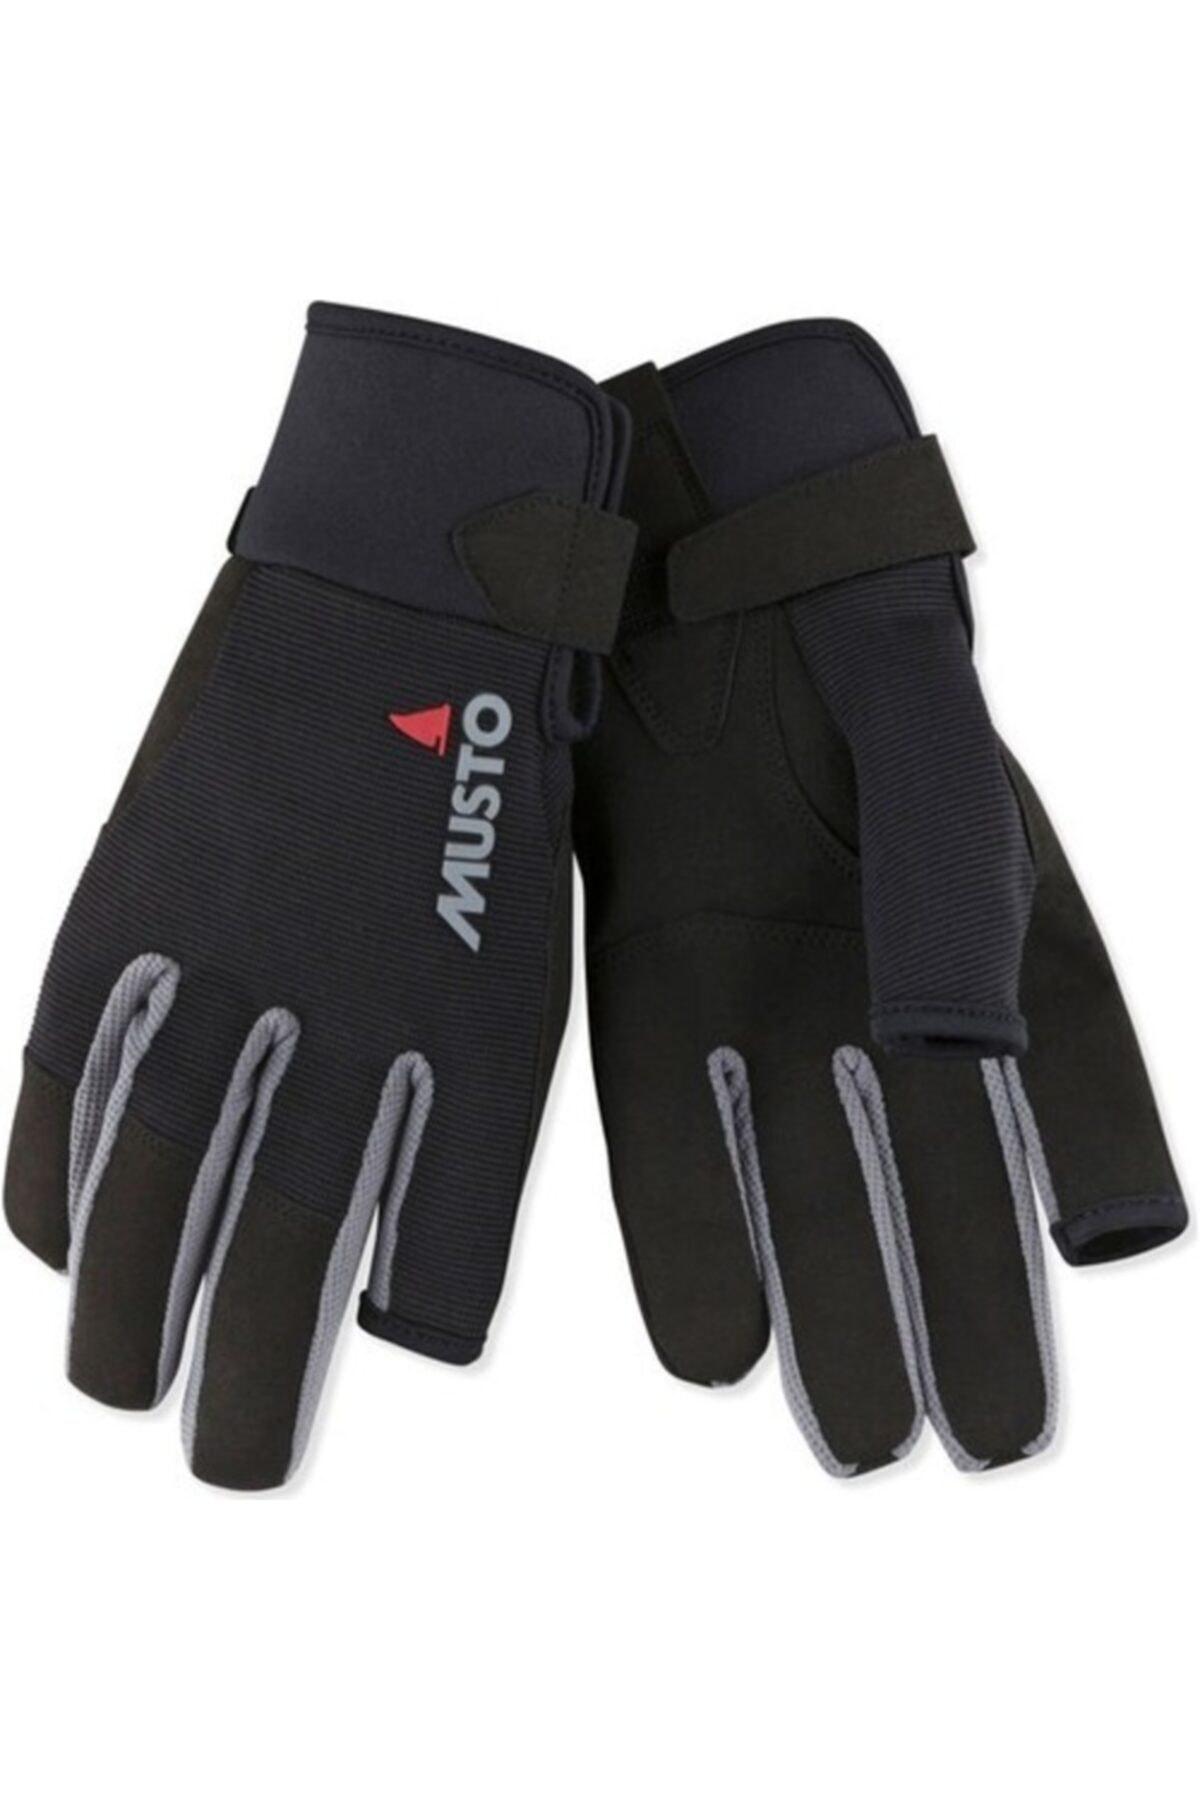 Musto Ess Sailing Lf Glove Siyah Yelken Eldiveni 1